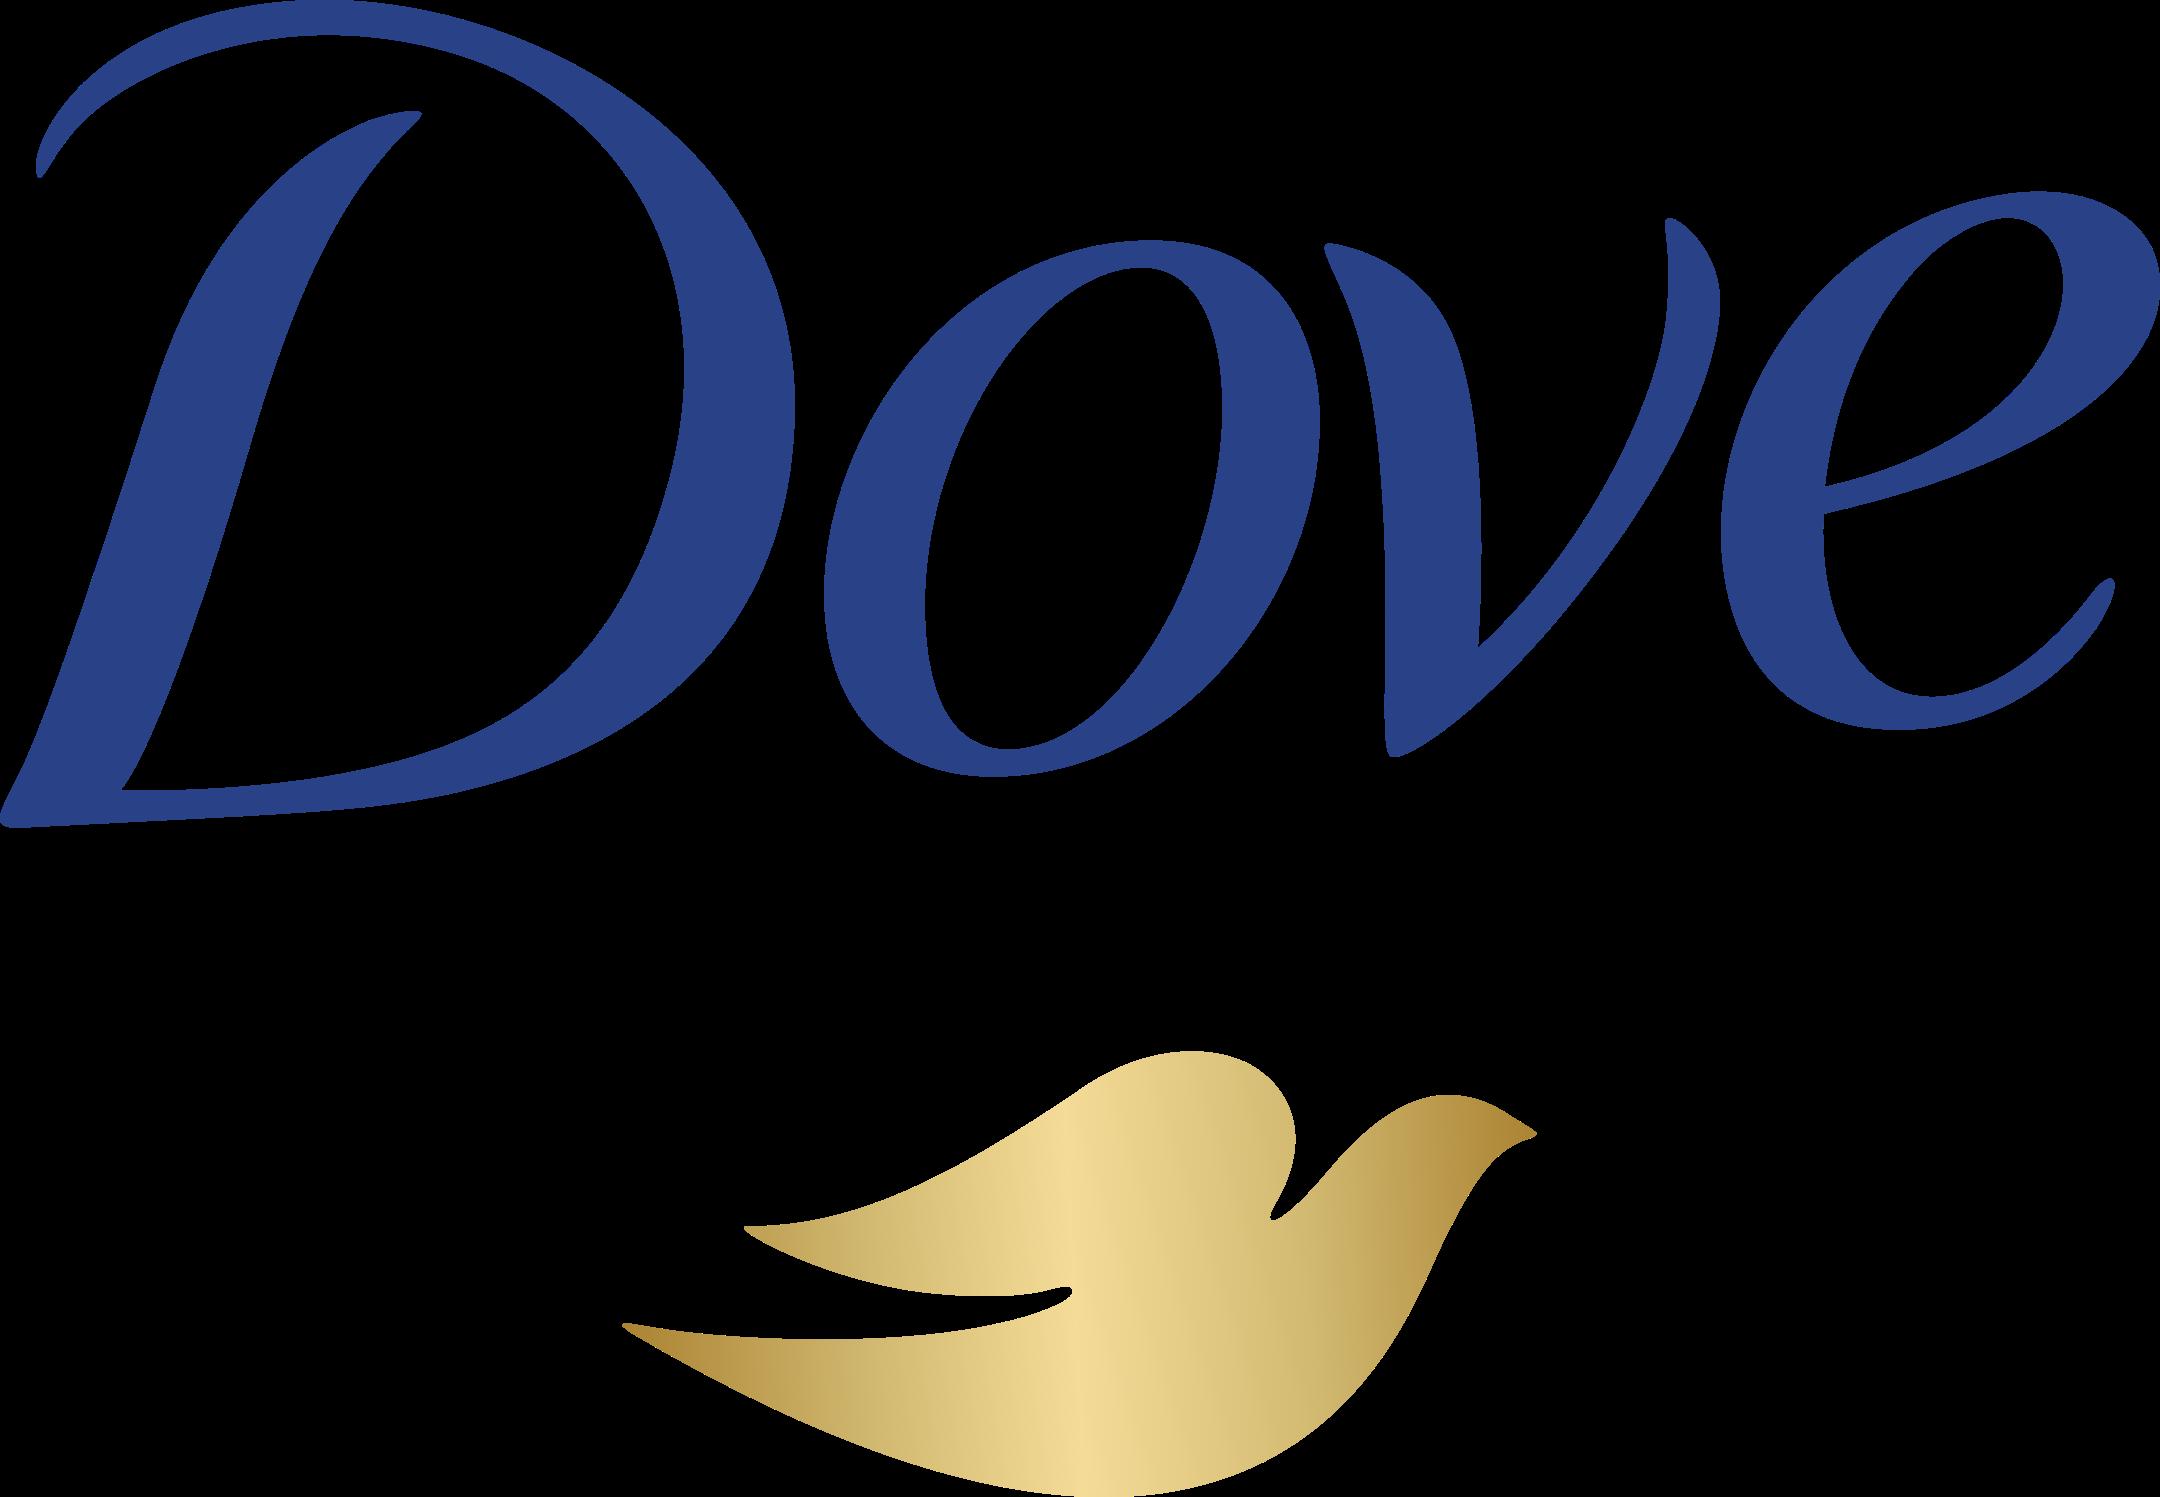 dove logo 1 - Dove Logo